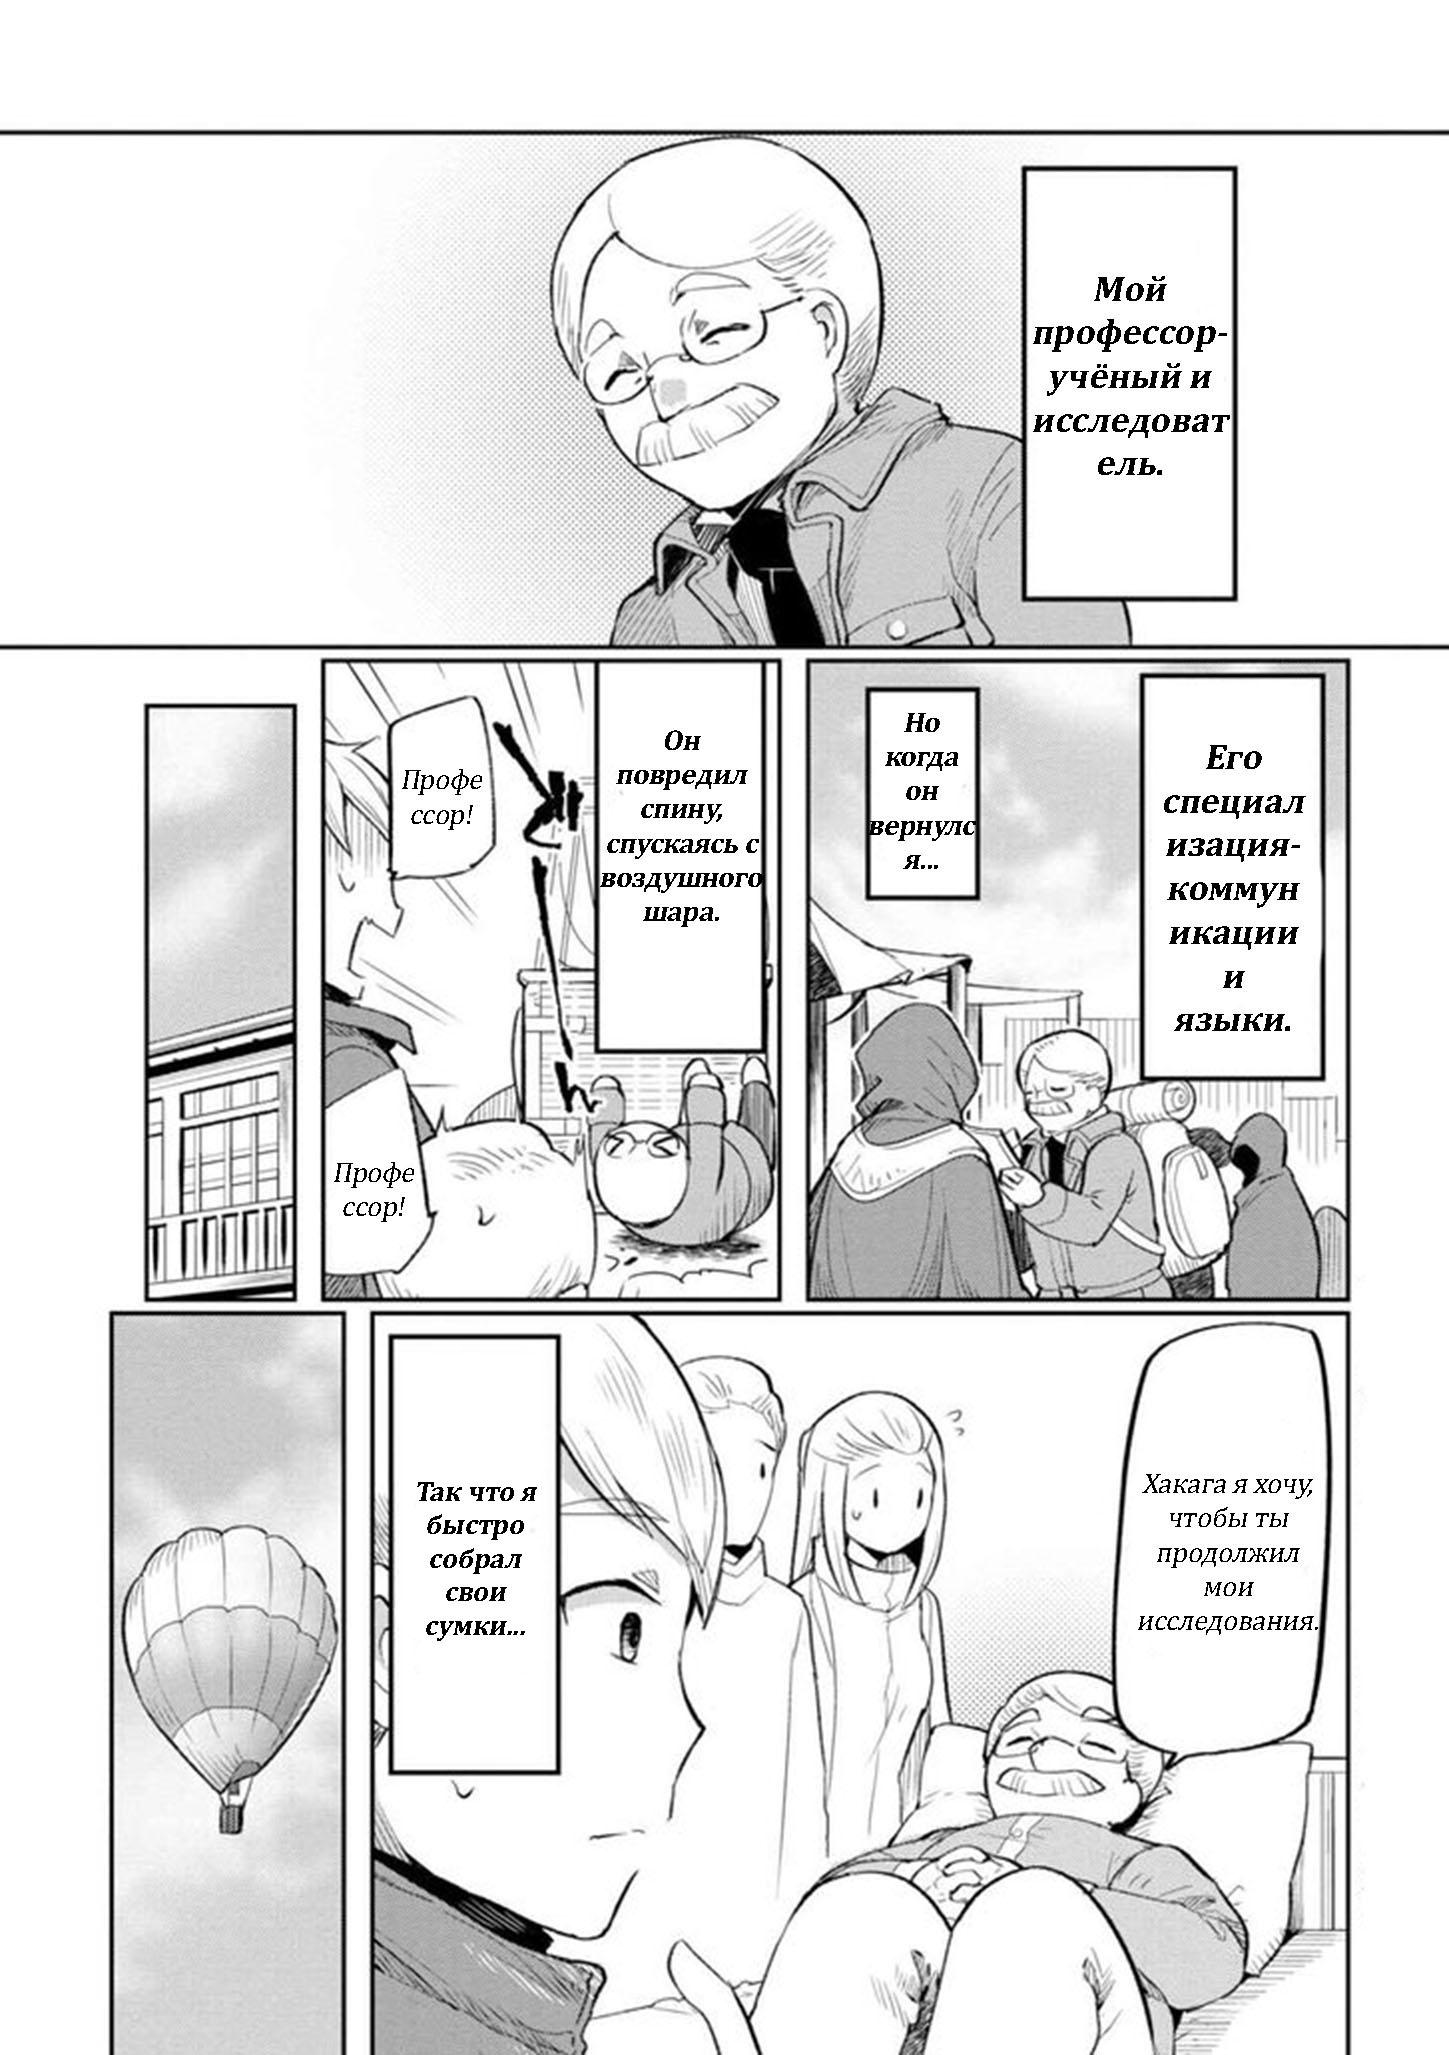 https://r1.ninemanga.com/comics/pic2/5/33797/414526/1529143547721.jpg Page 1